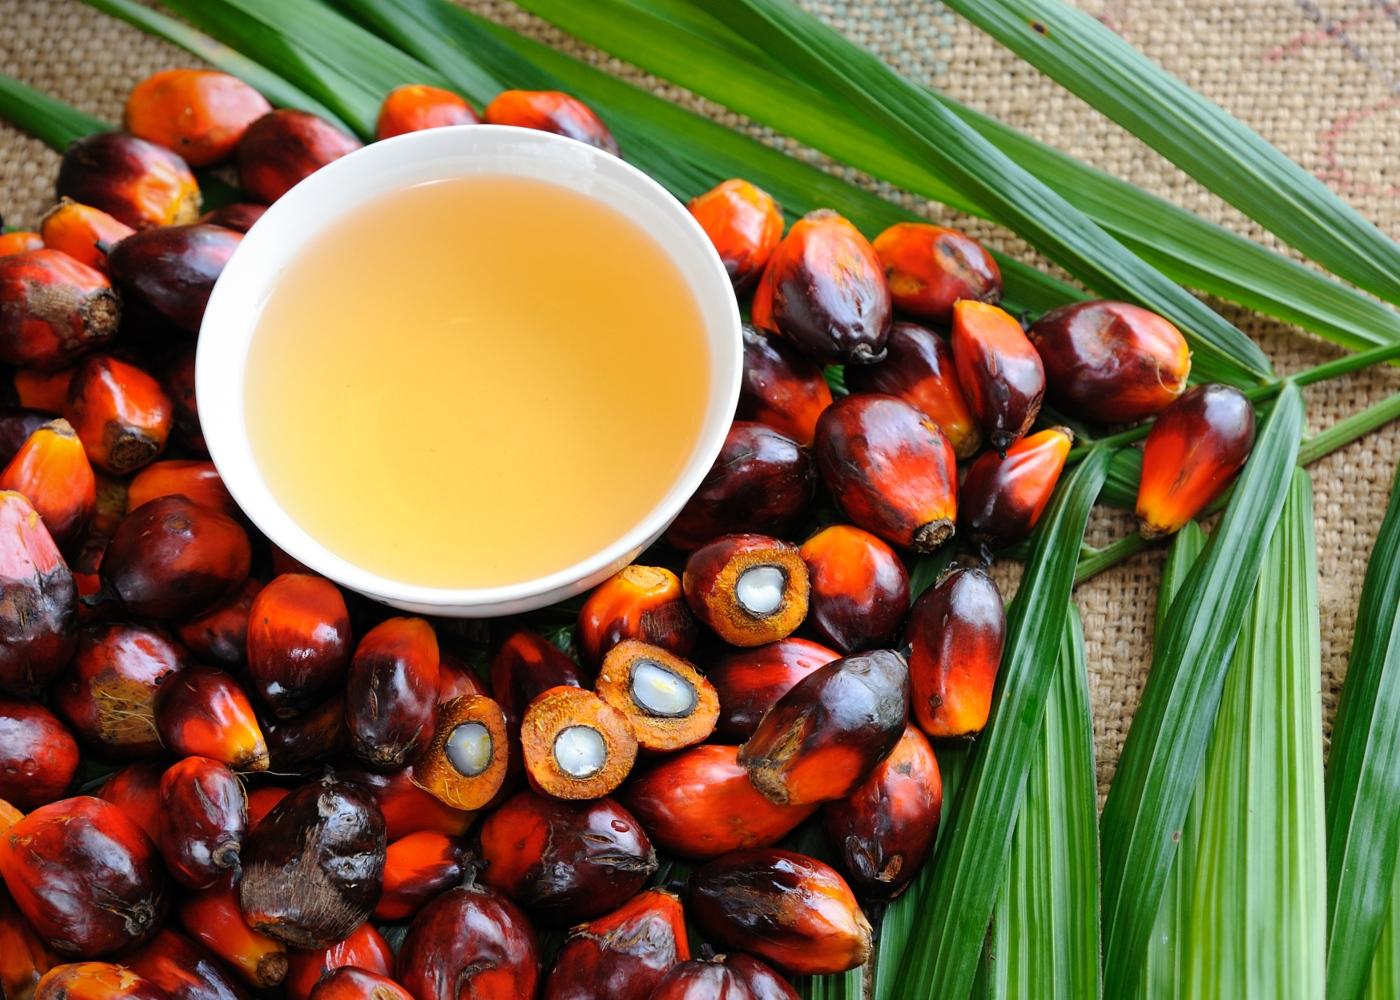 Taça com óleo de palma